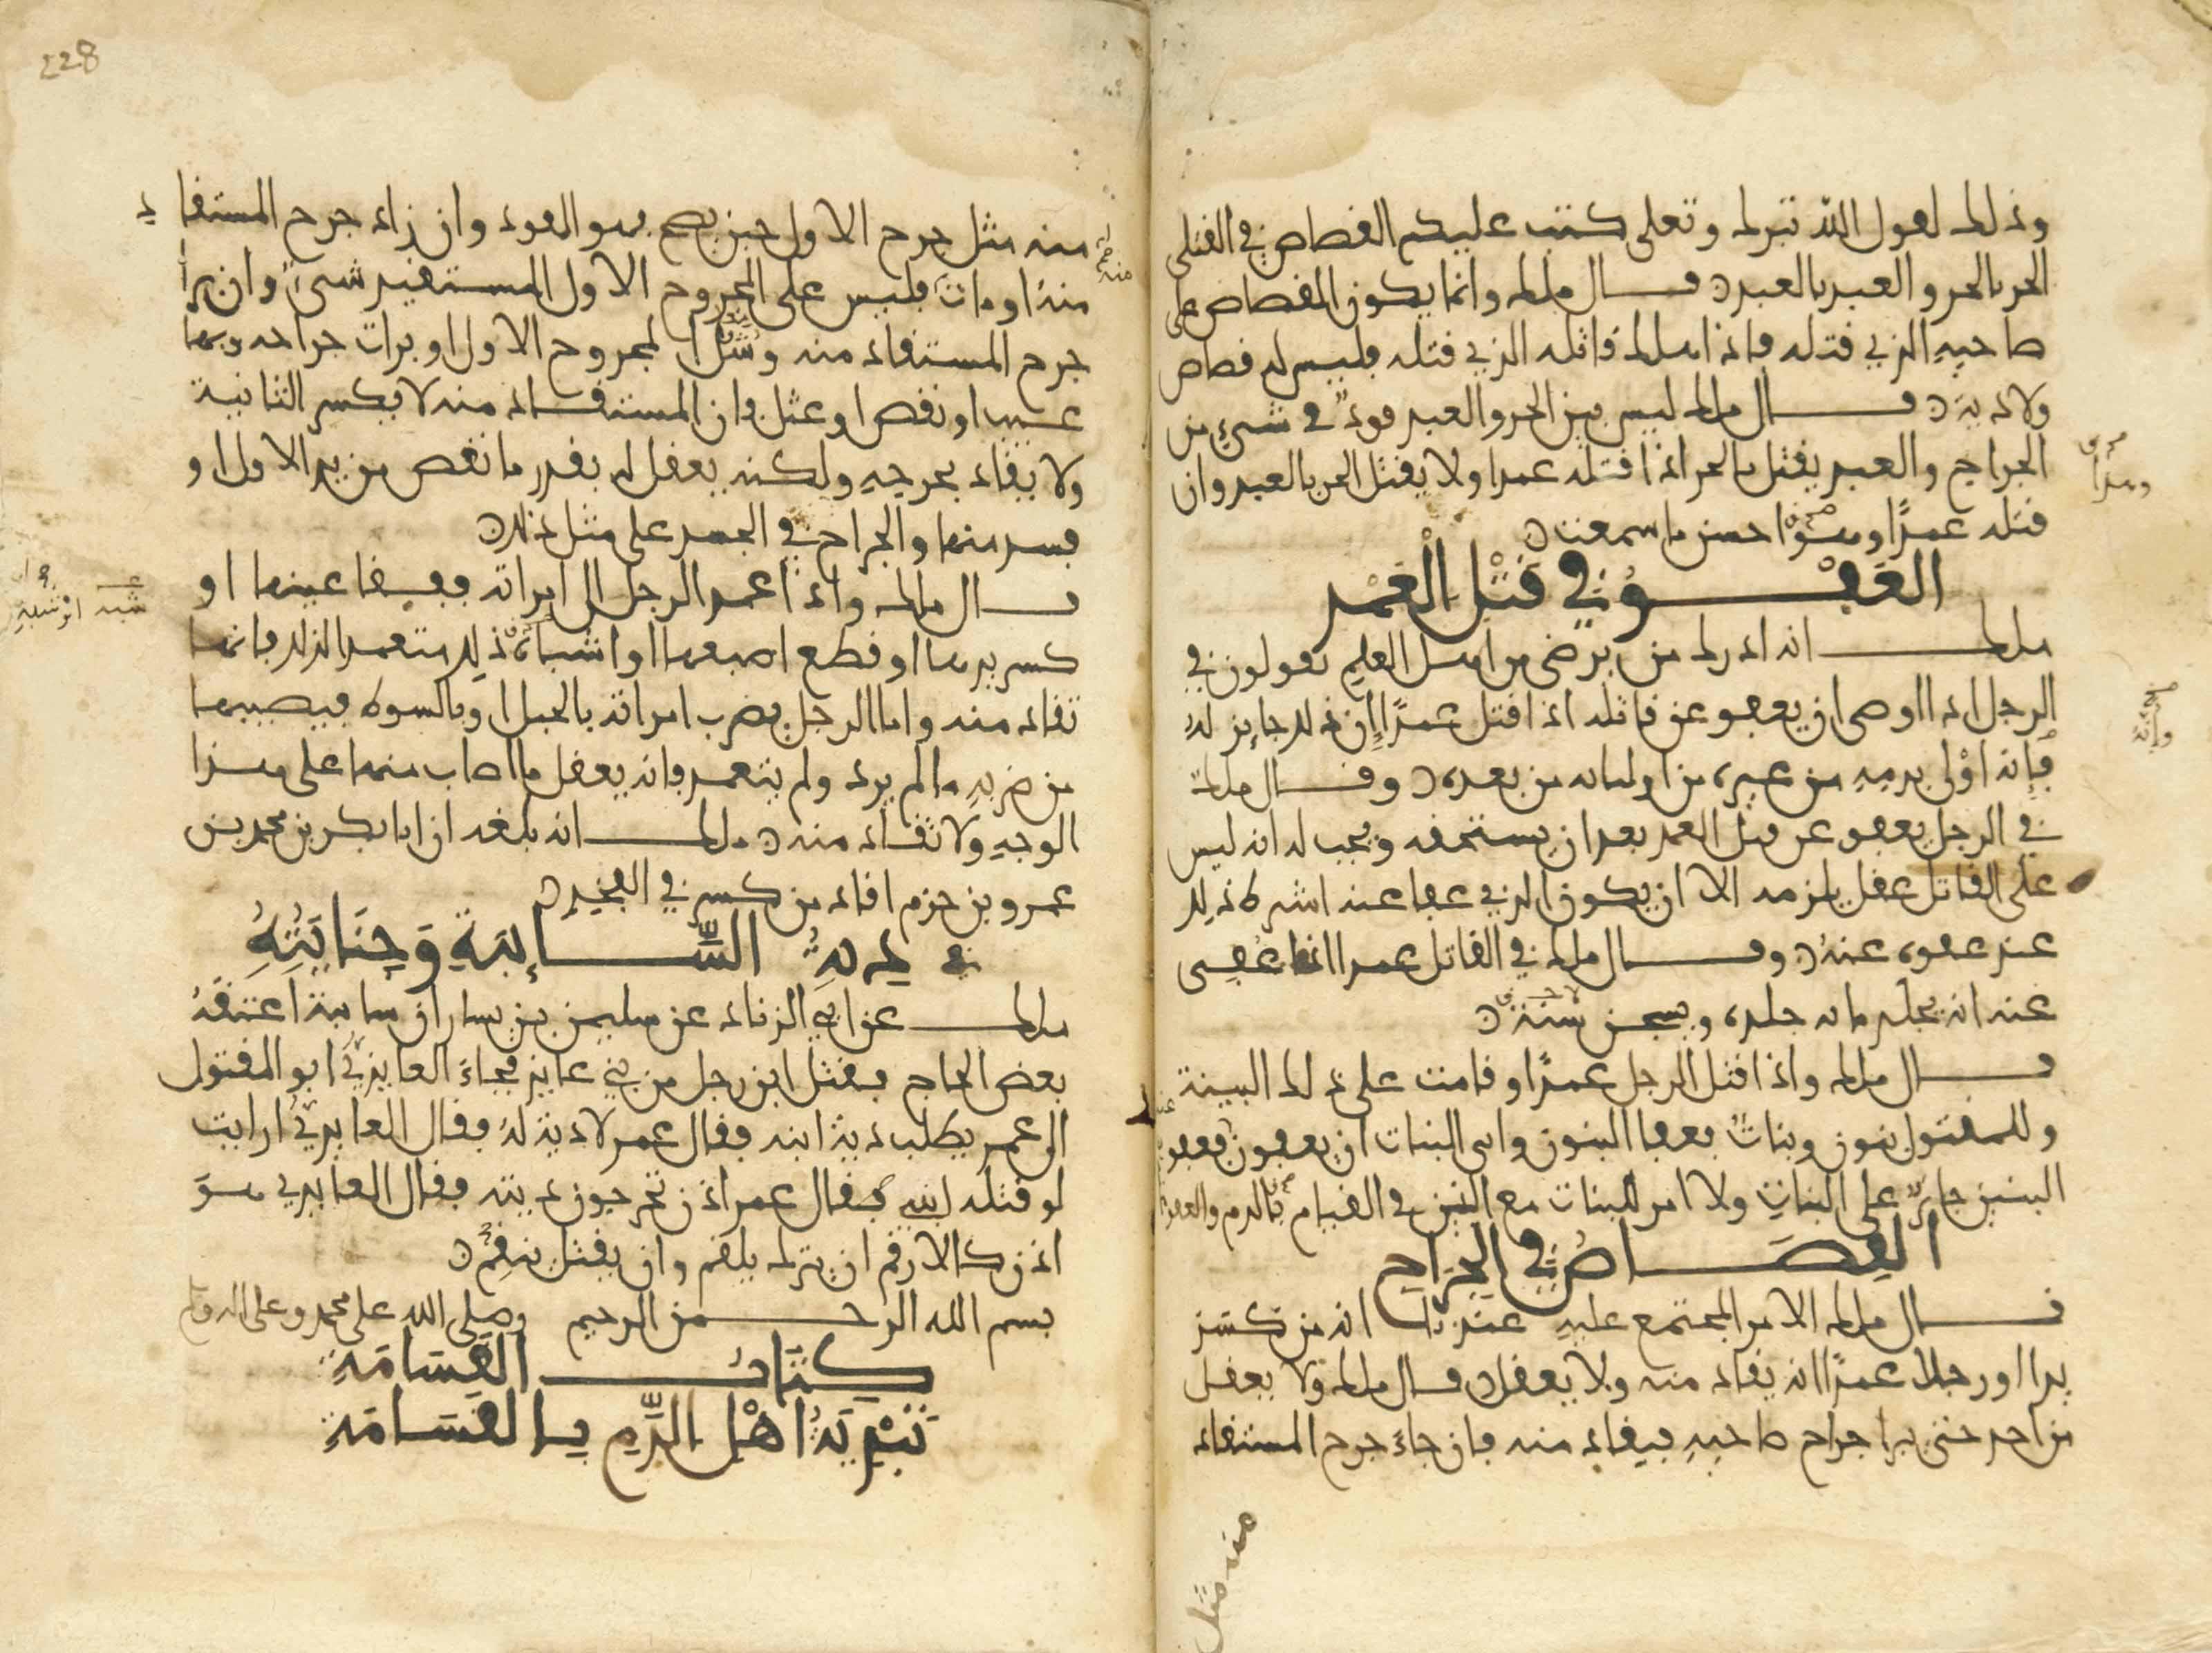 IMAM AL-MALIK BIN ANAS (D. AH